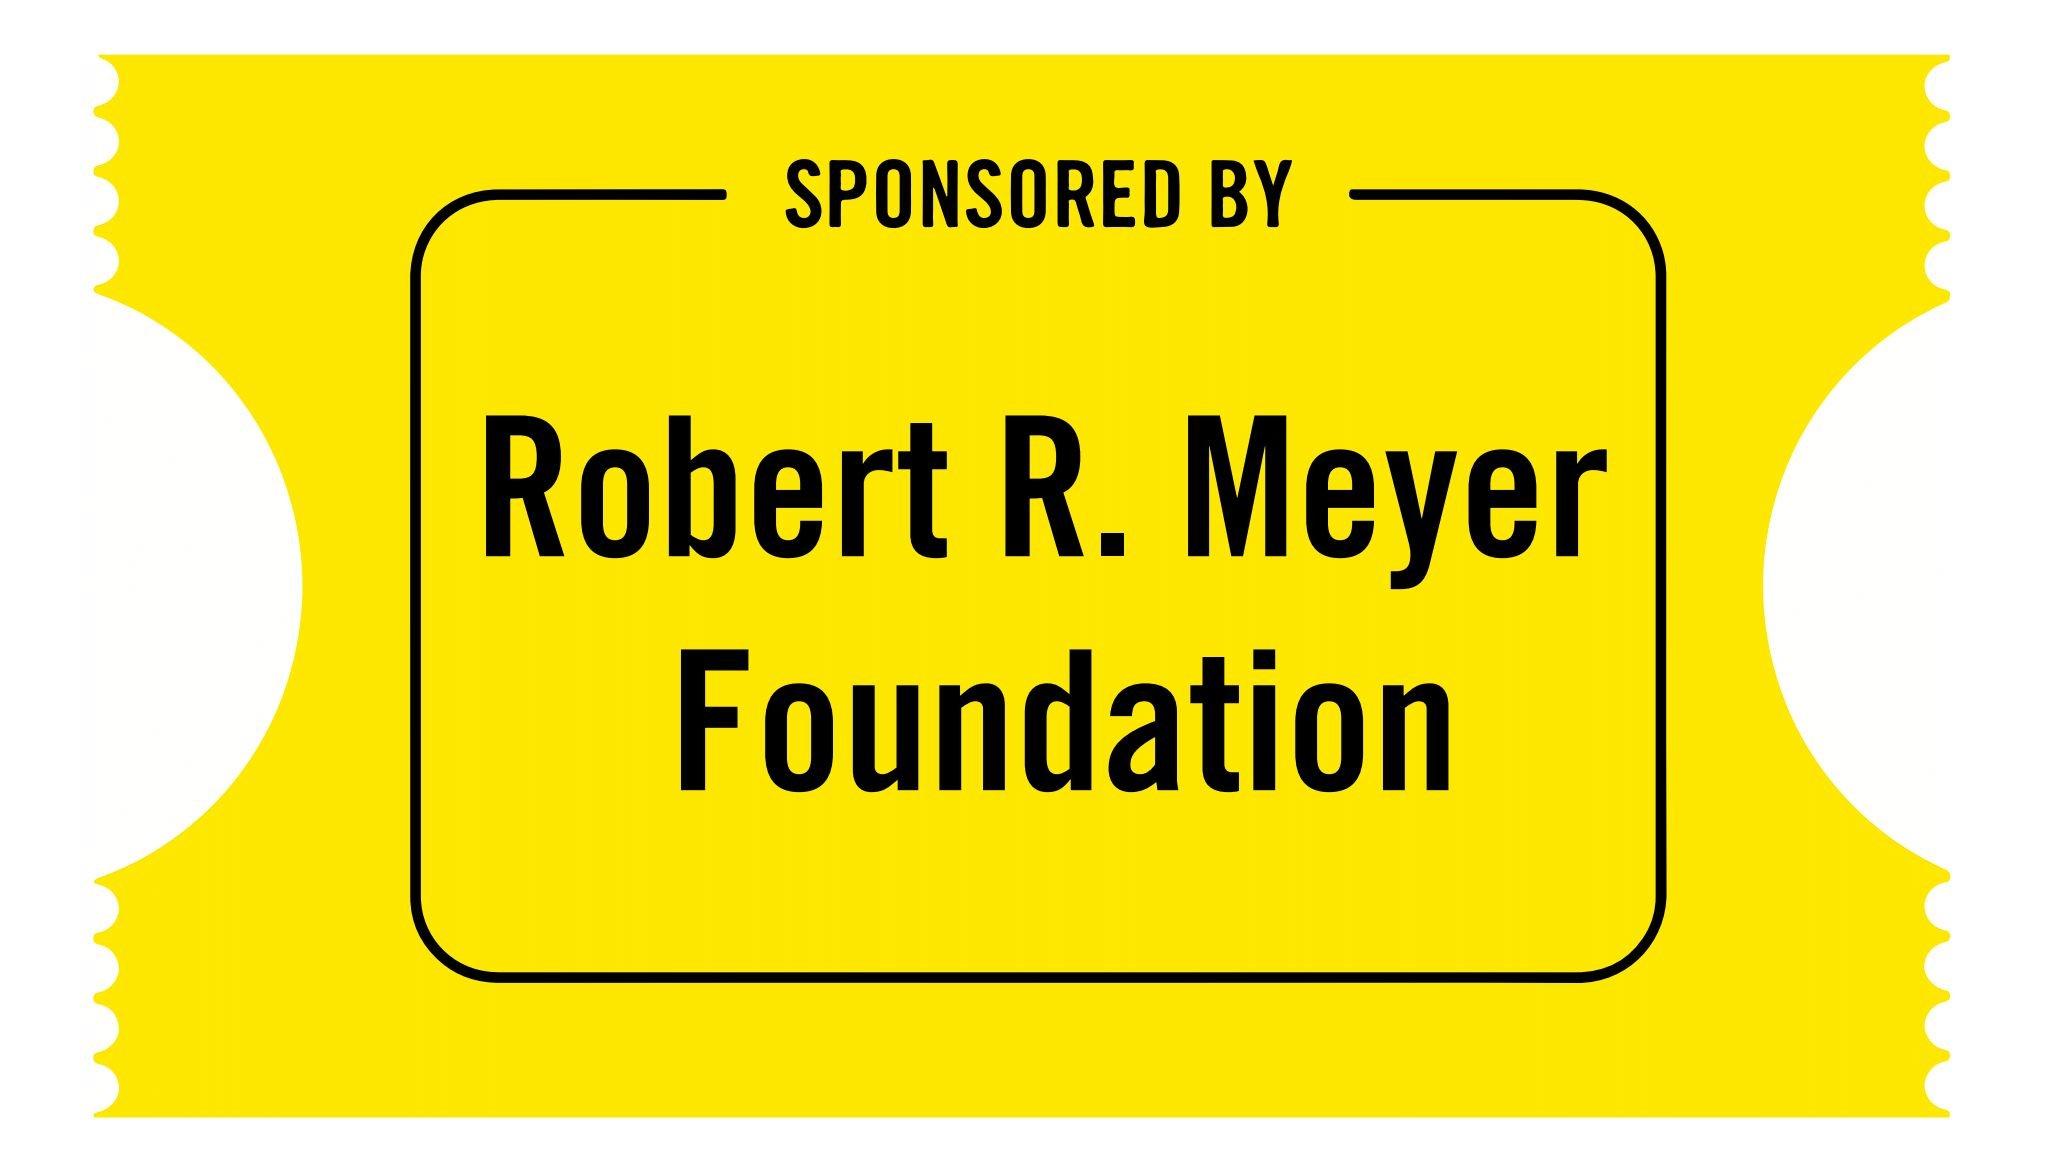 Robert R. Meyer Foundation